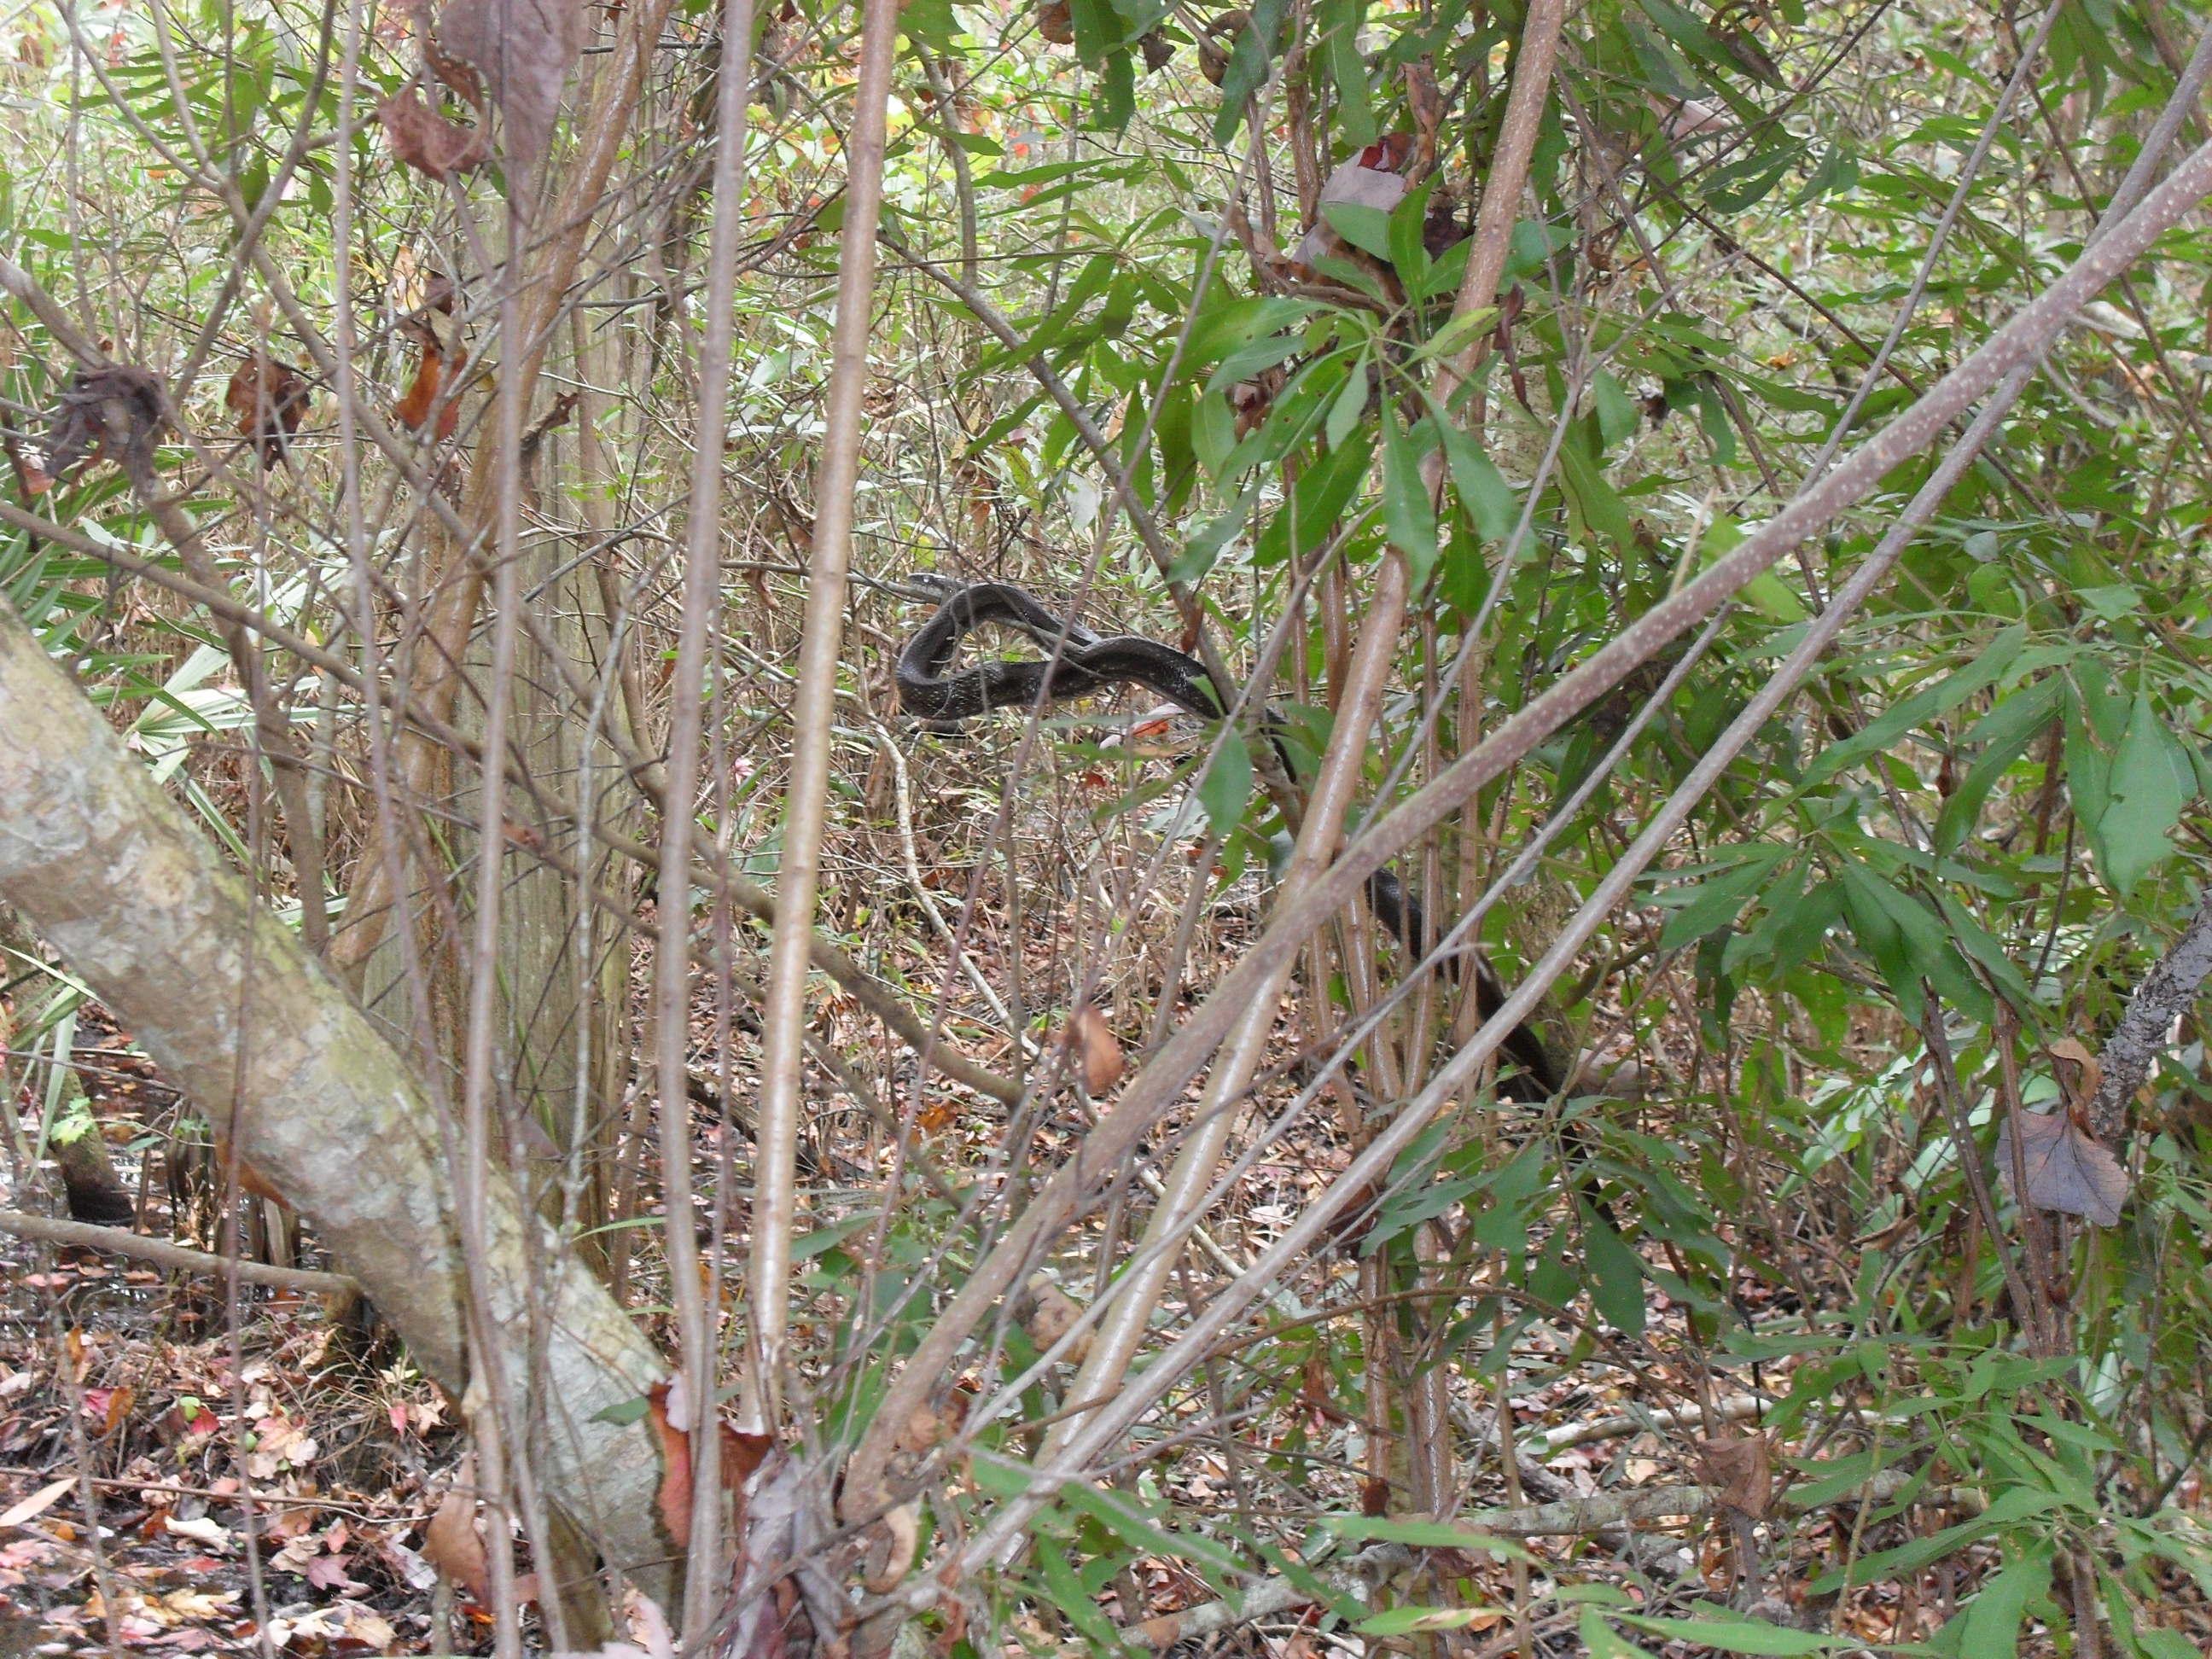 snakes in north carolina concord clayton maintenance garden